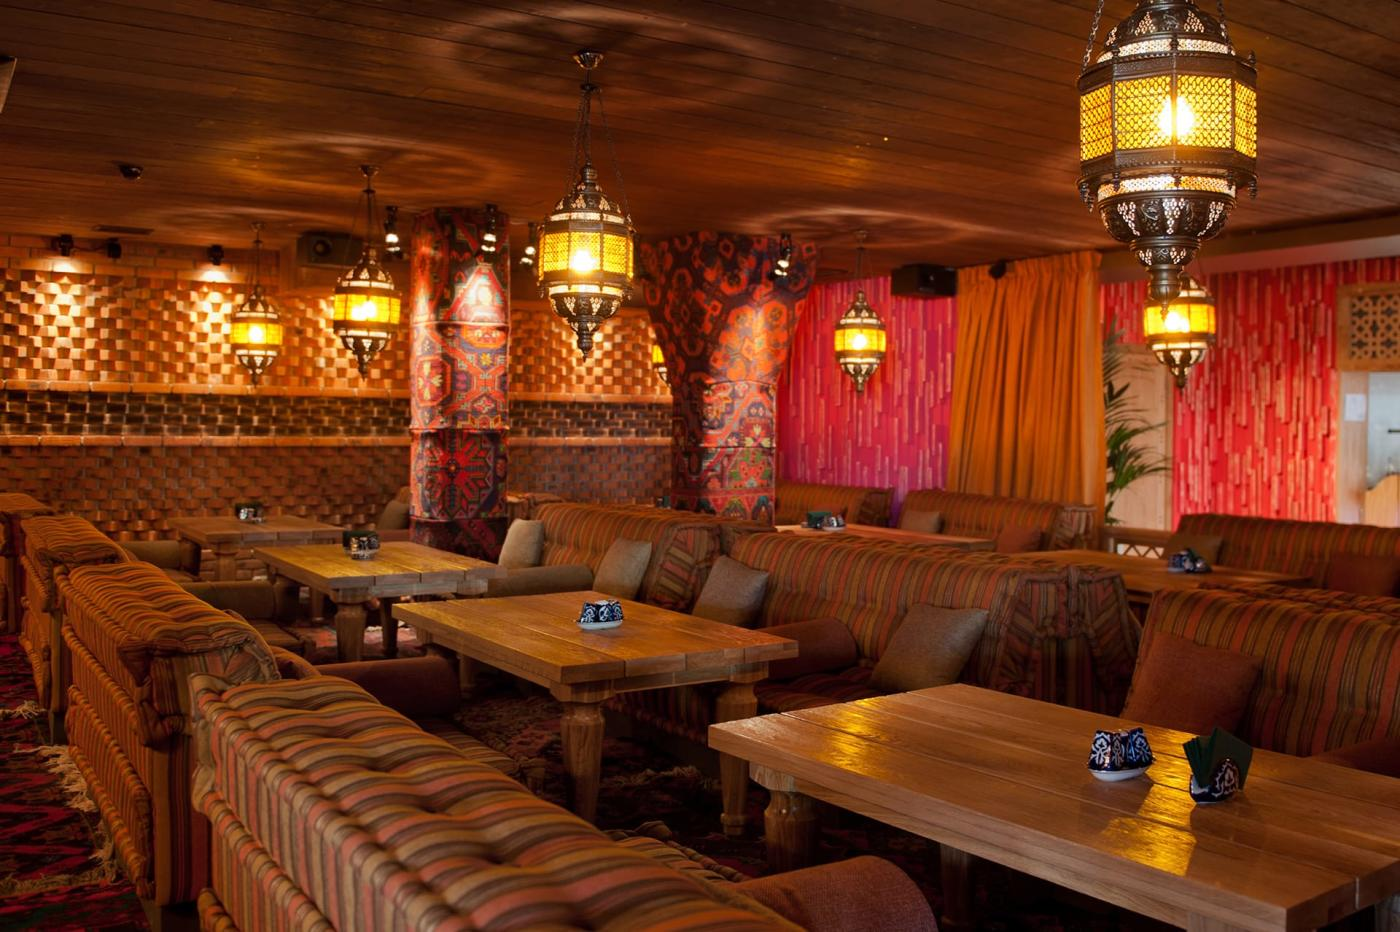 Ресторан Тапчан Площадь Ильича (Римская / Сергия Радонежского - Топчан) фото 2